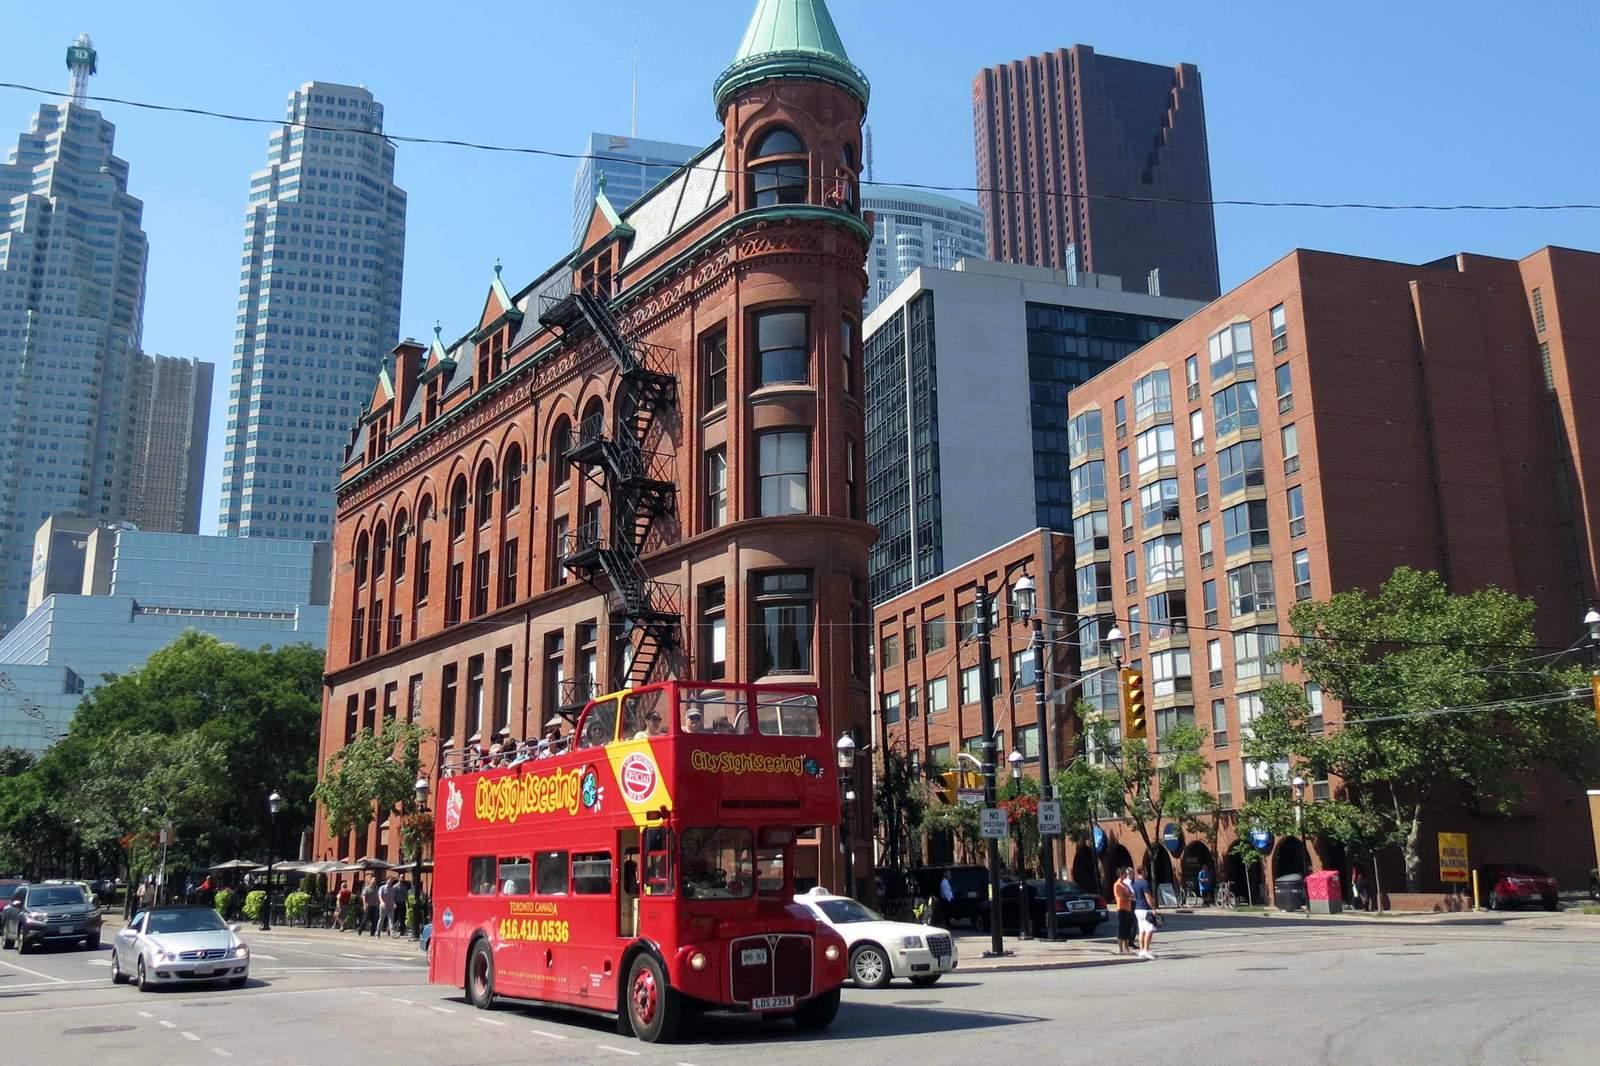 Toronto Stadtrundfahrt Step on - Step off, Halt vor dem Gooderham Building